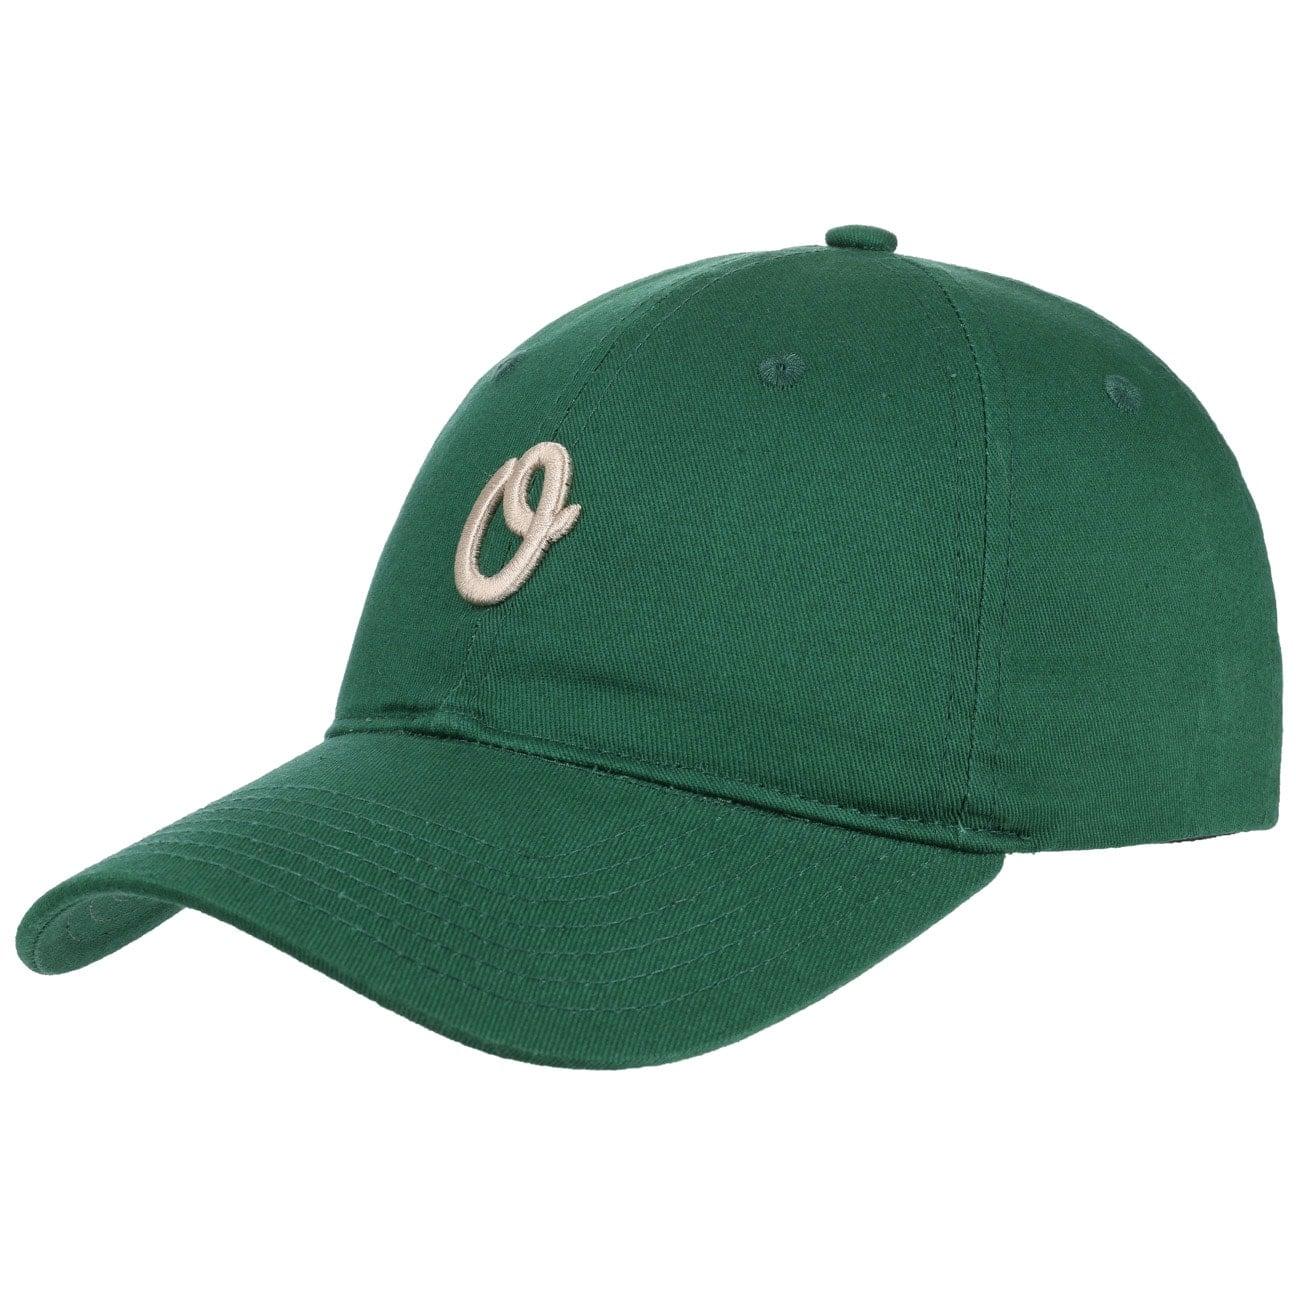 Casquette Miles Olo II by Official Headwear  baseball cap